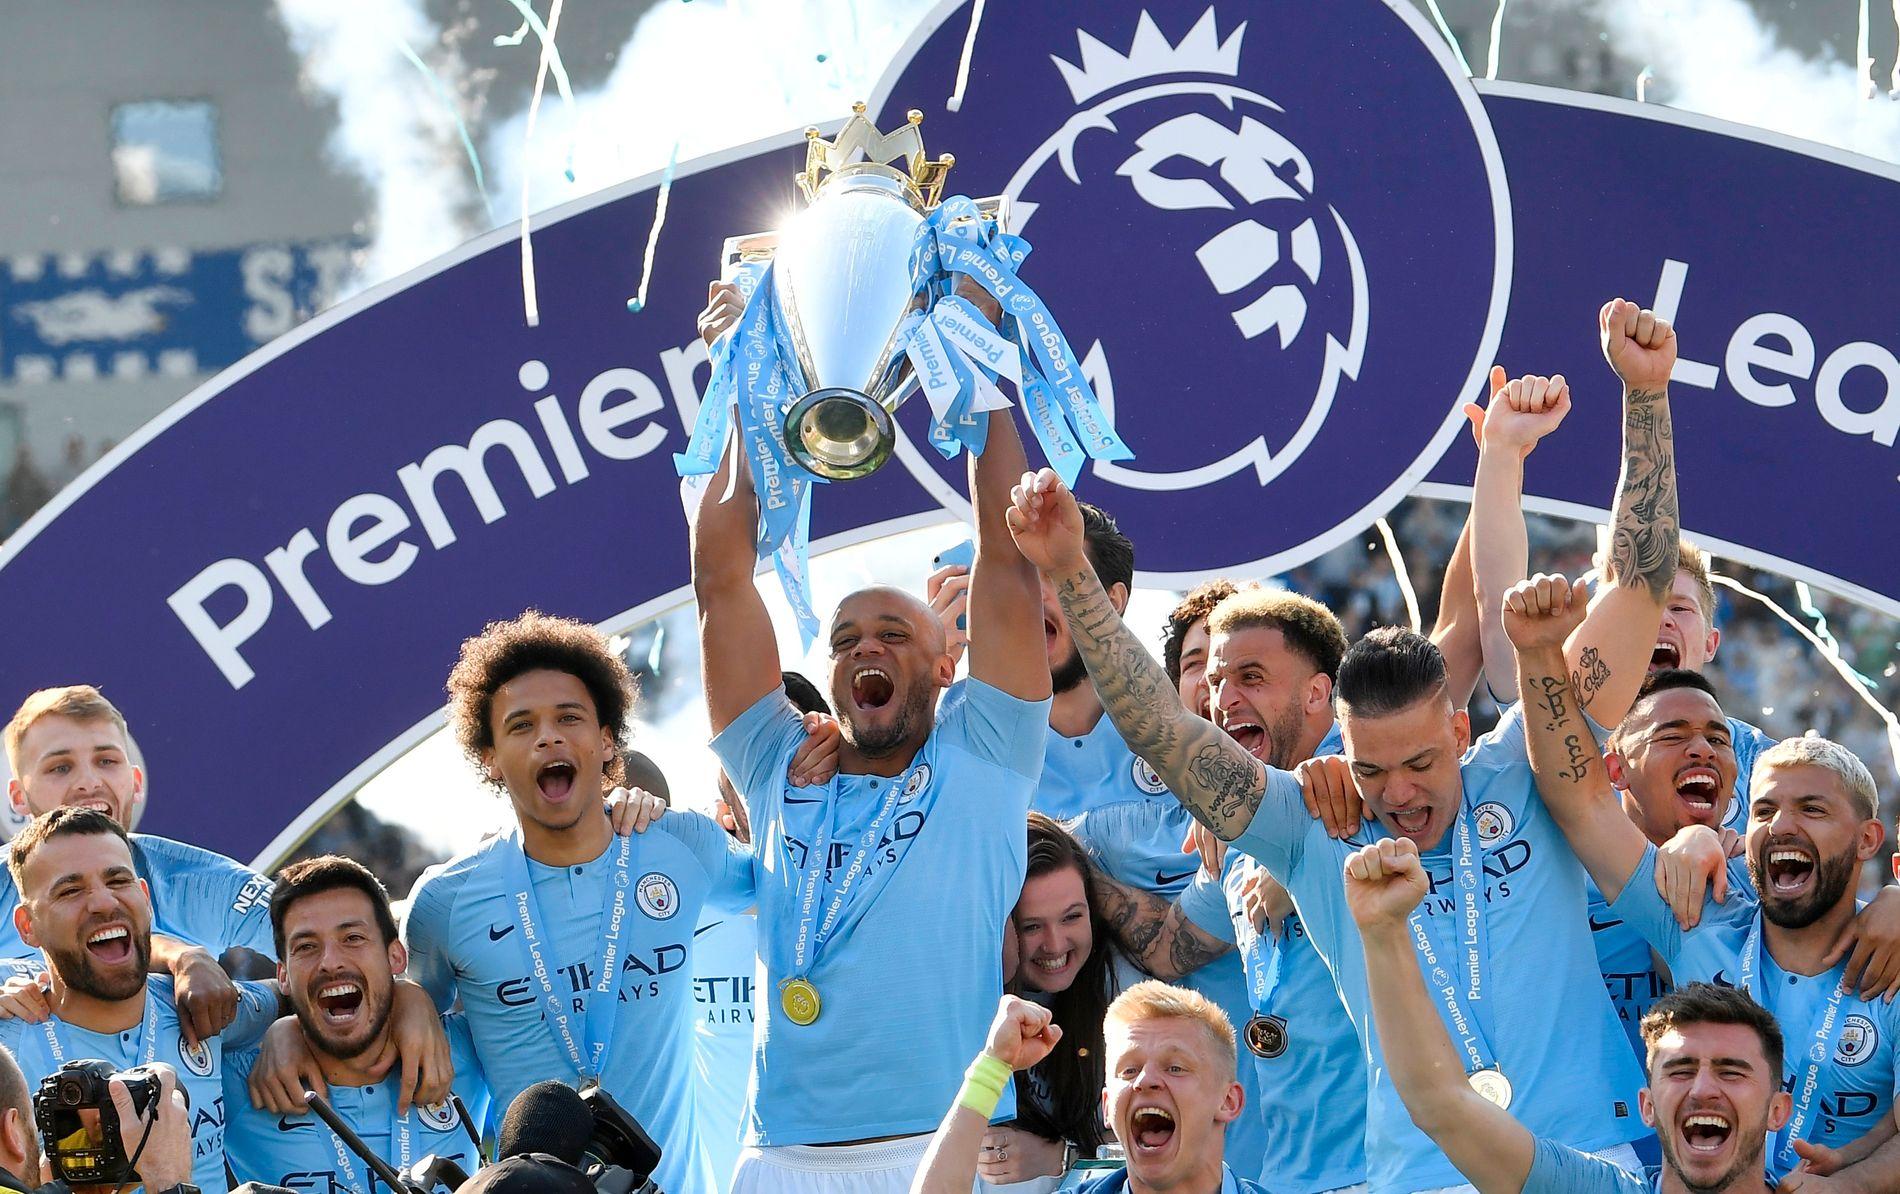 MESTERE: Vincent Kompany kunne løfte pokalen som et bevis på at Manchester City var det beste laget i Premier League 2018/19, etter at de sikret ligagullet med 4–1-seier over Brighton på American Express Community Stadium.